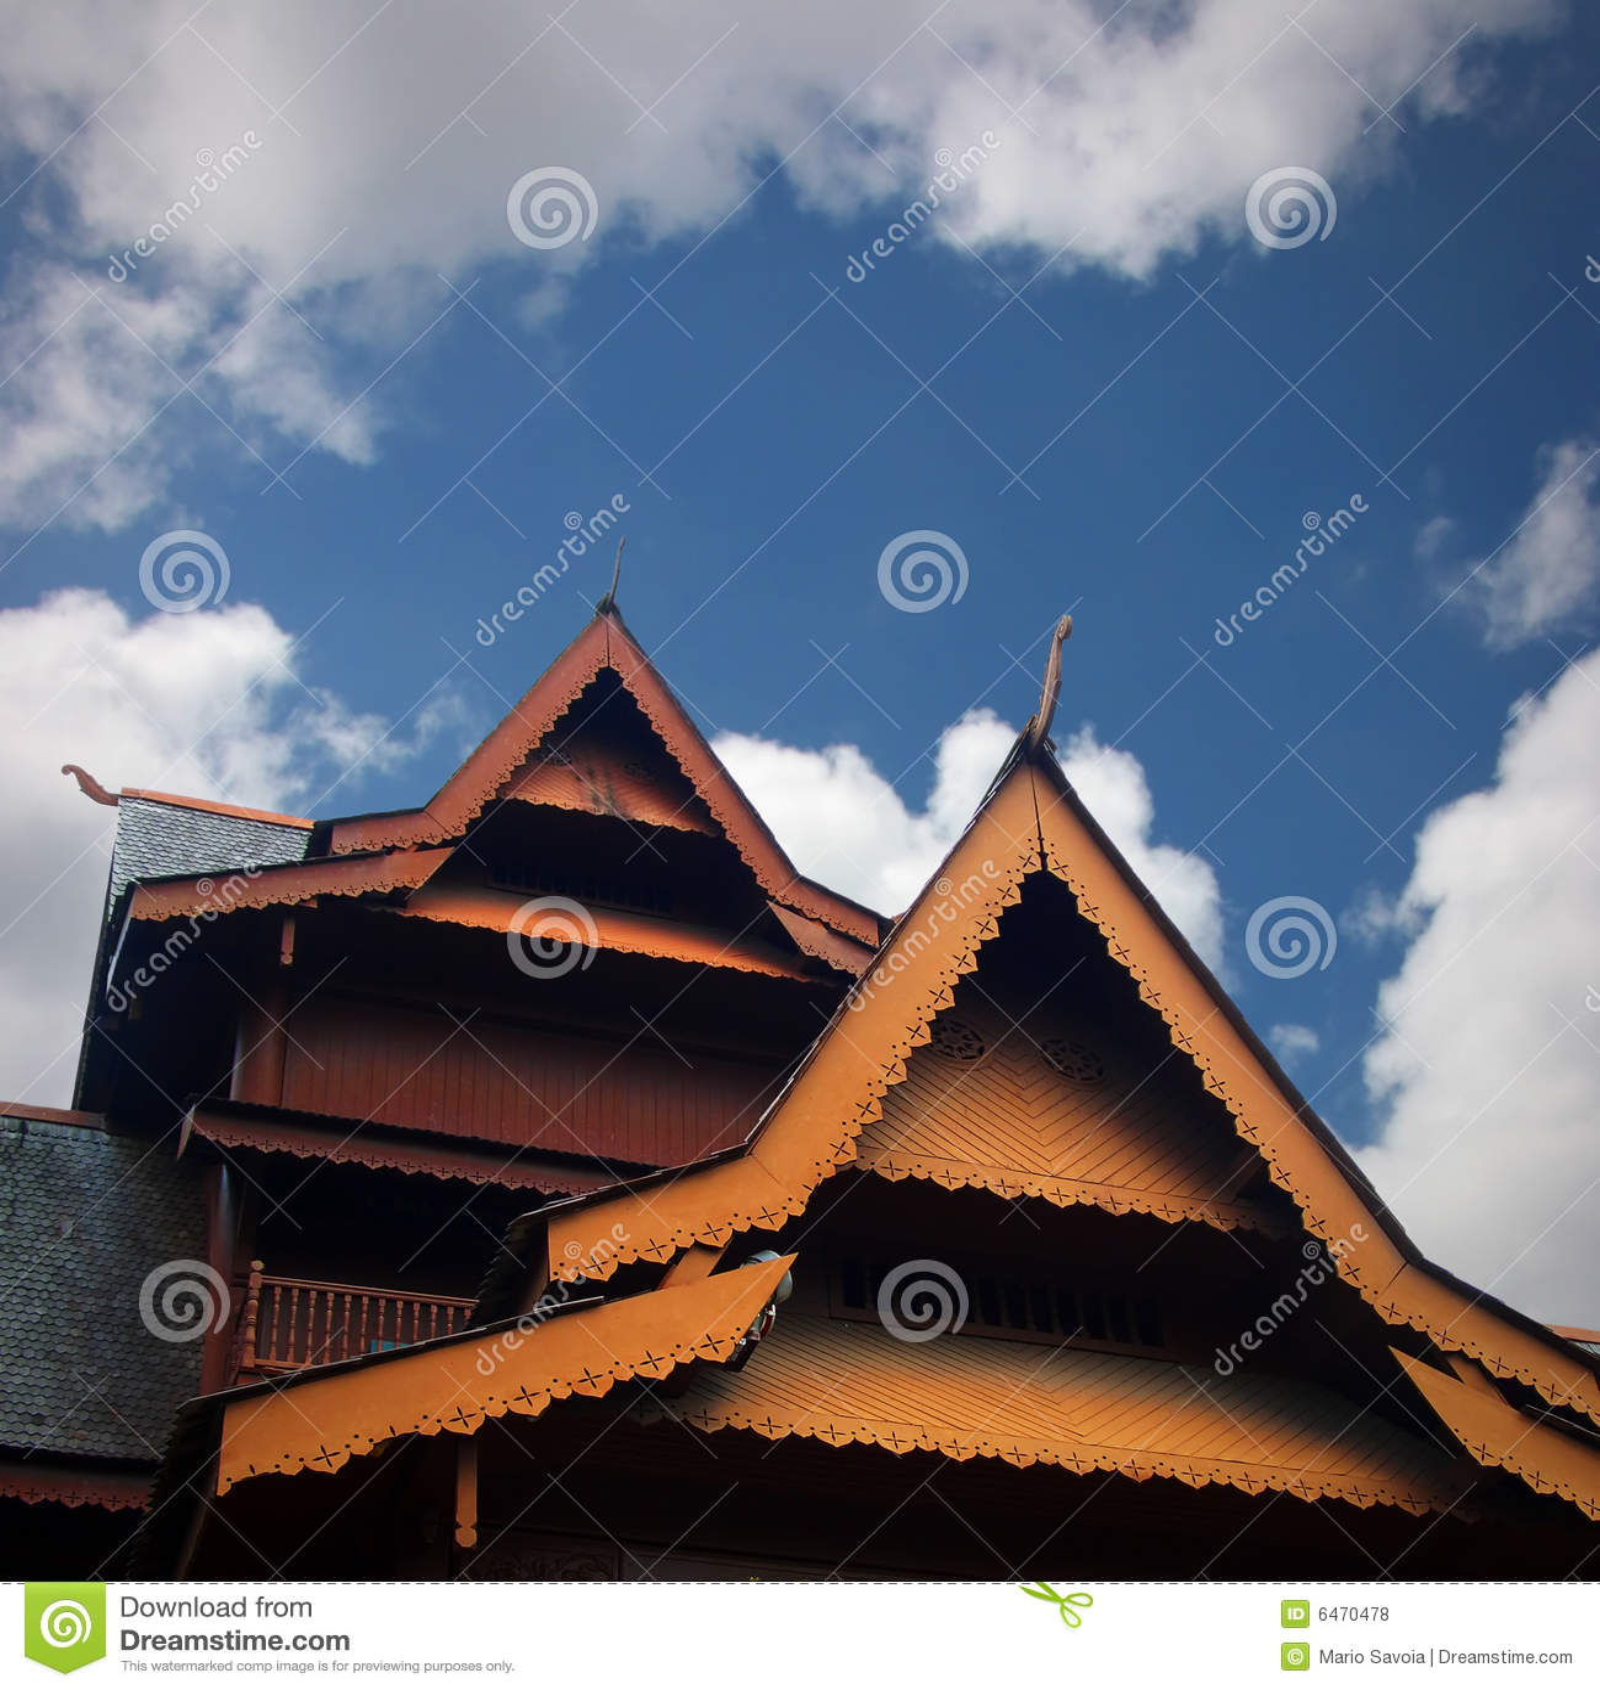 W tek dach